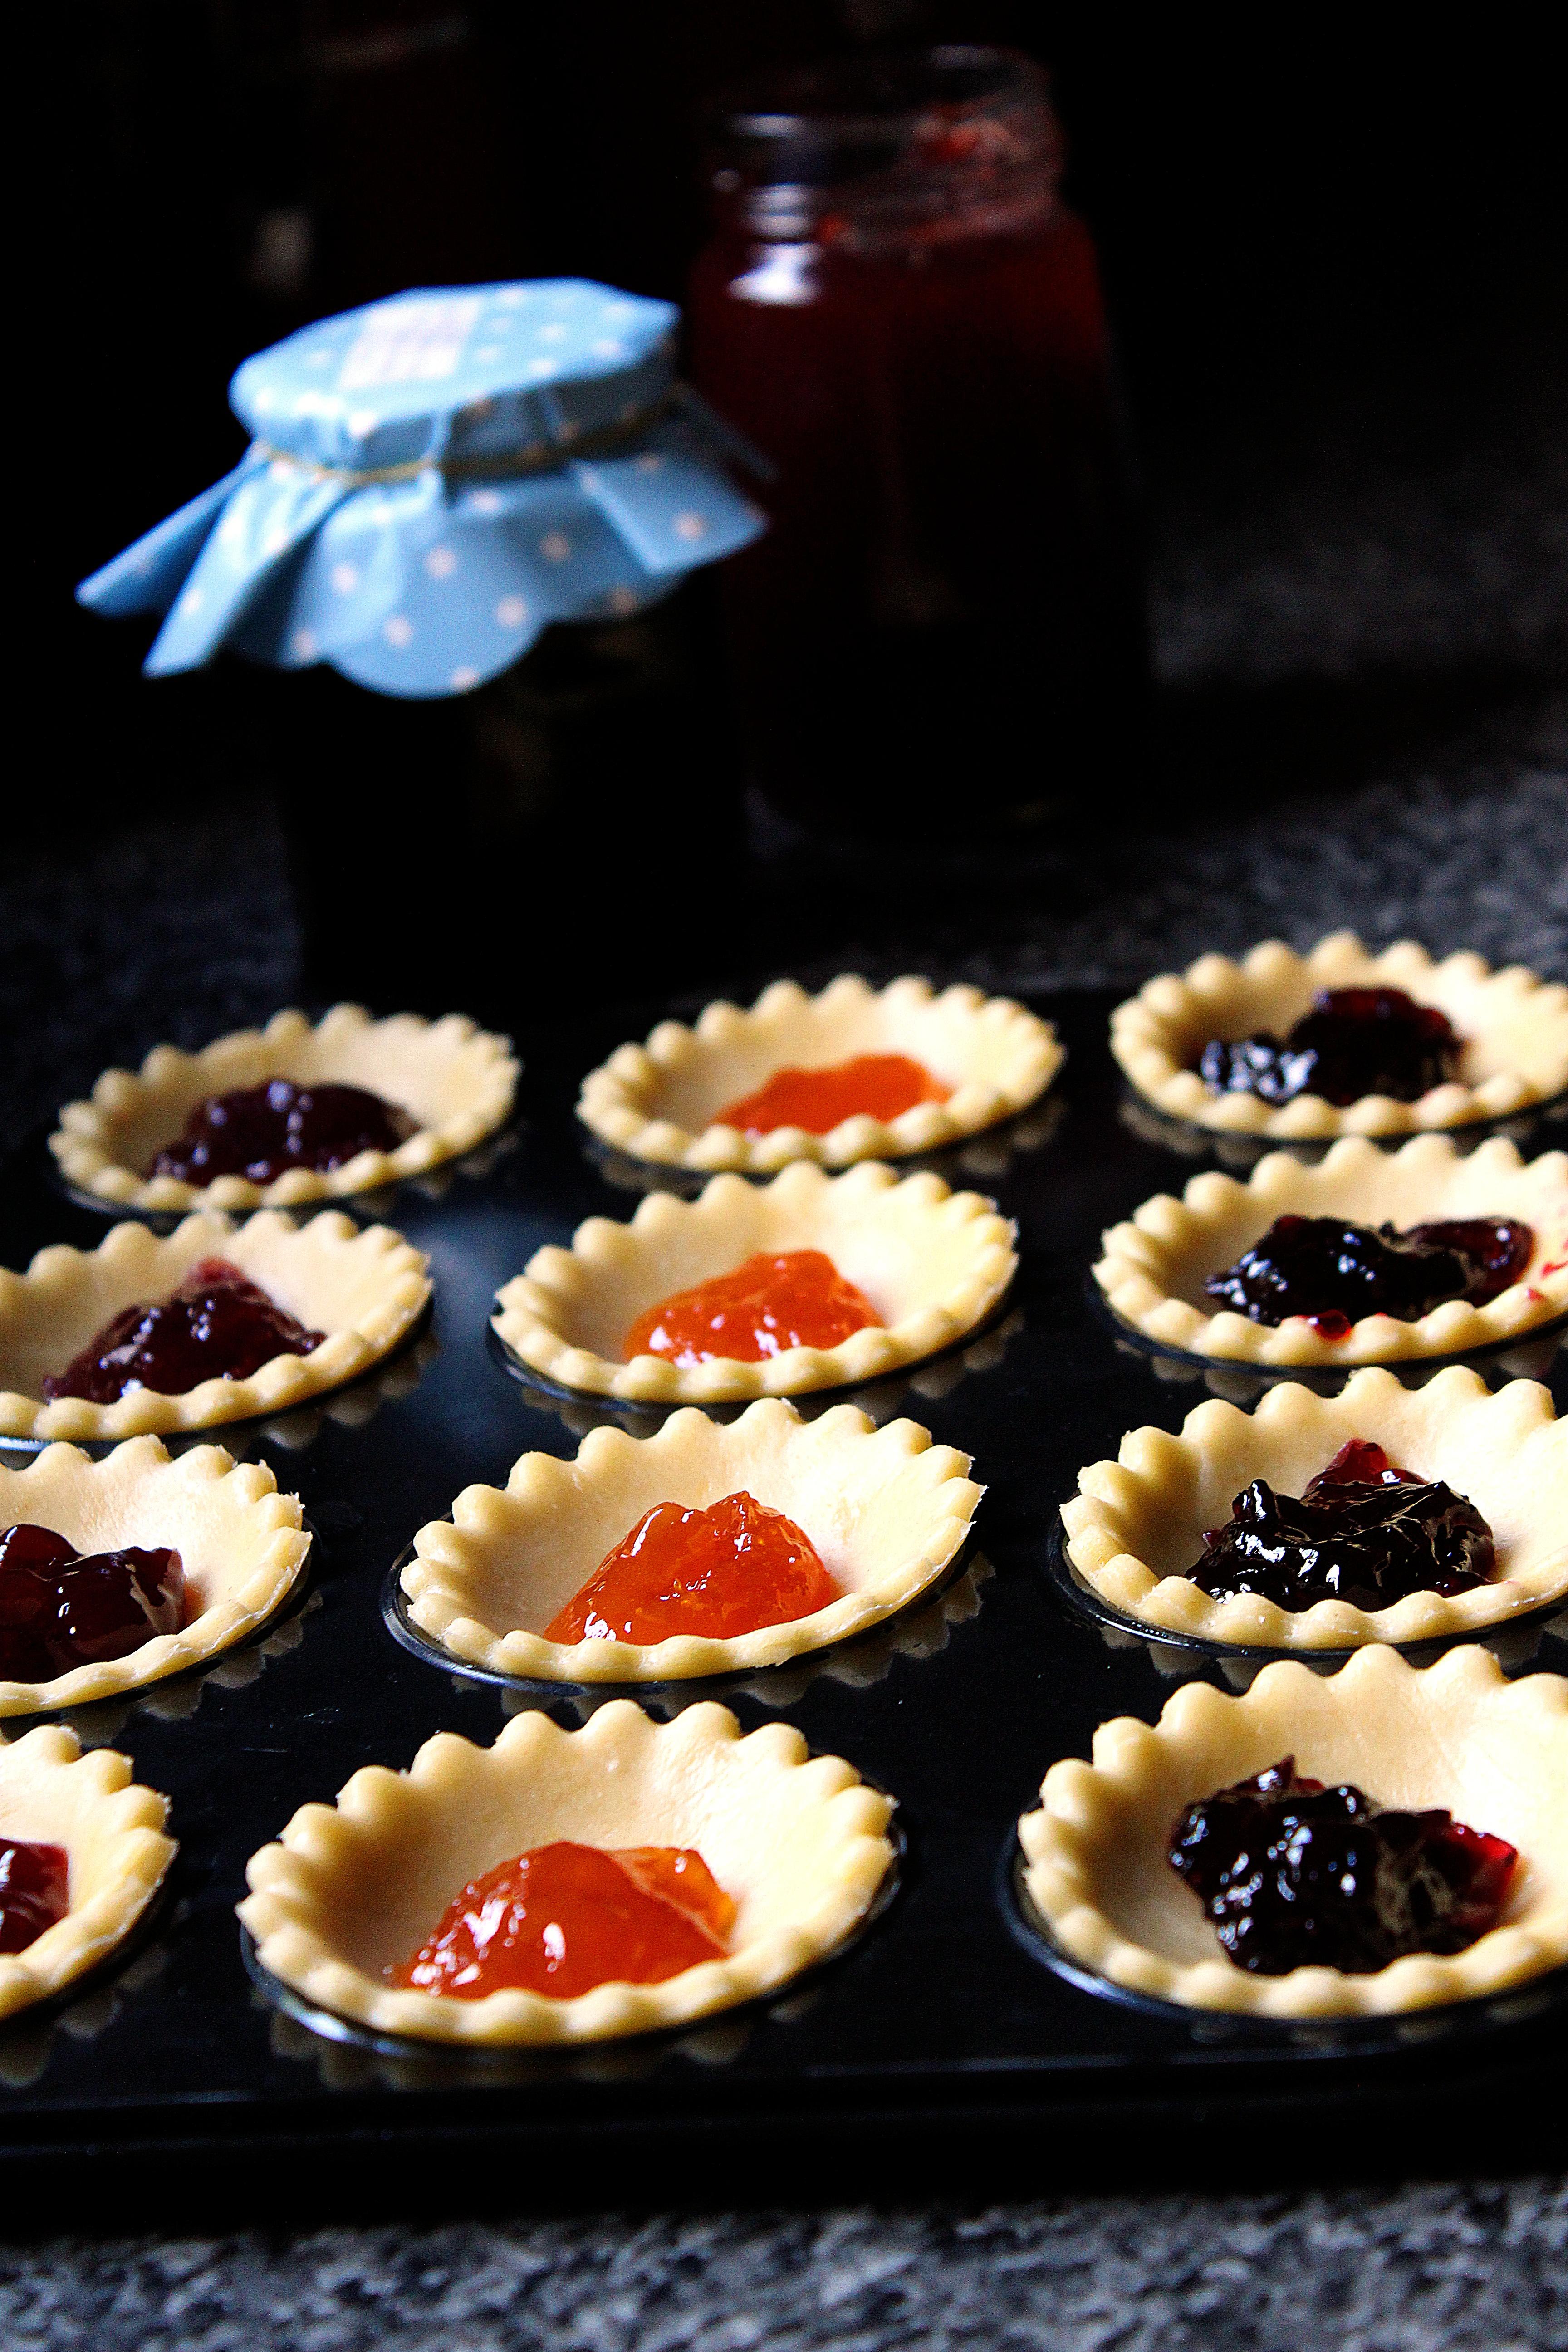 Gambar Meja Buah Berry Hidangan Makan Makanan Menghasilkan